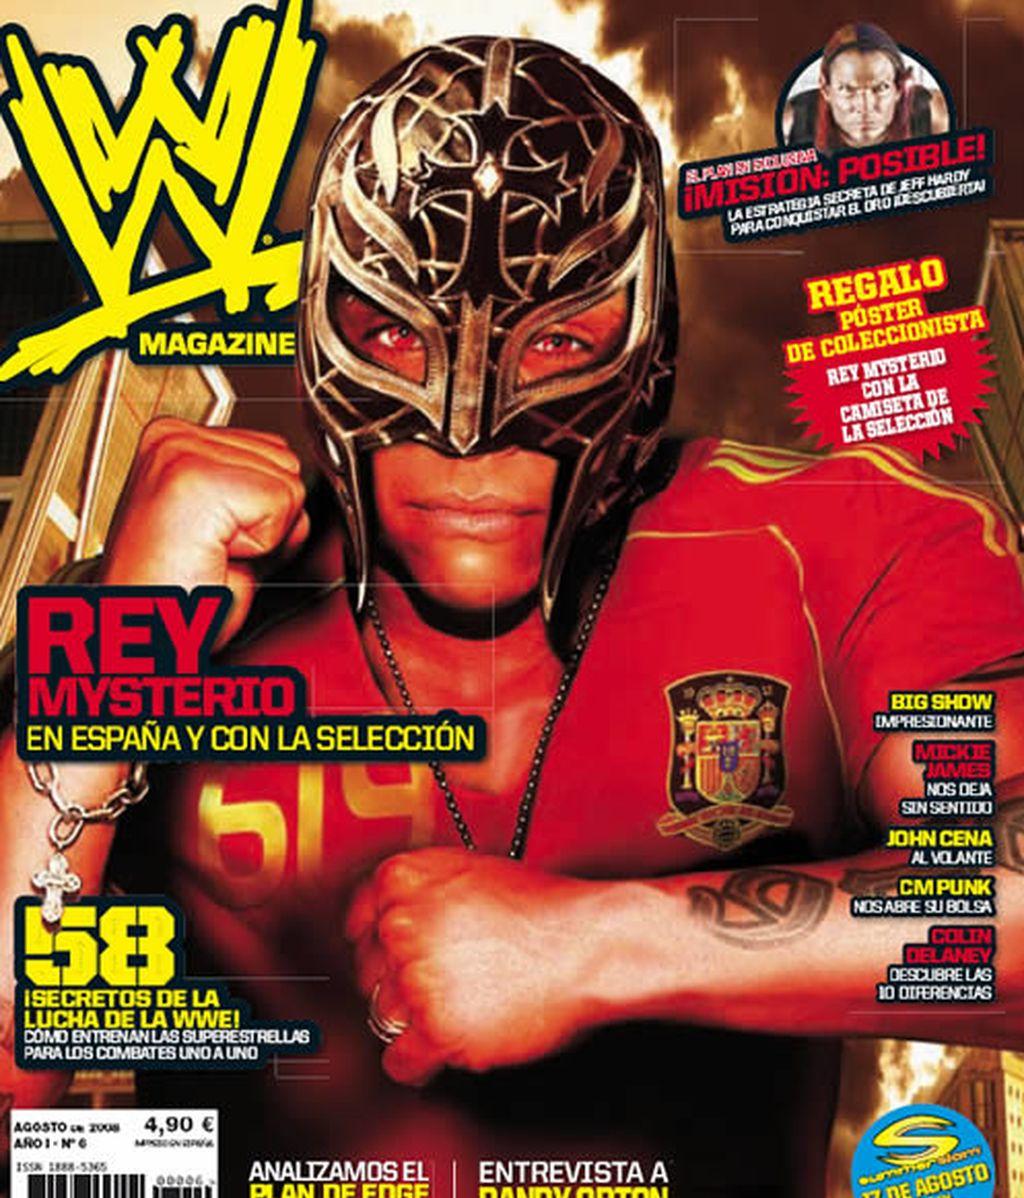 Revista agosto 2008